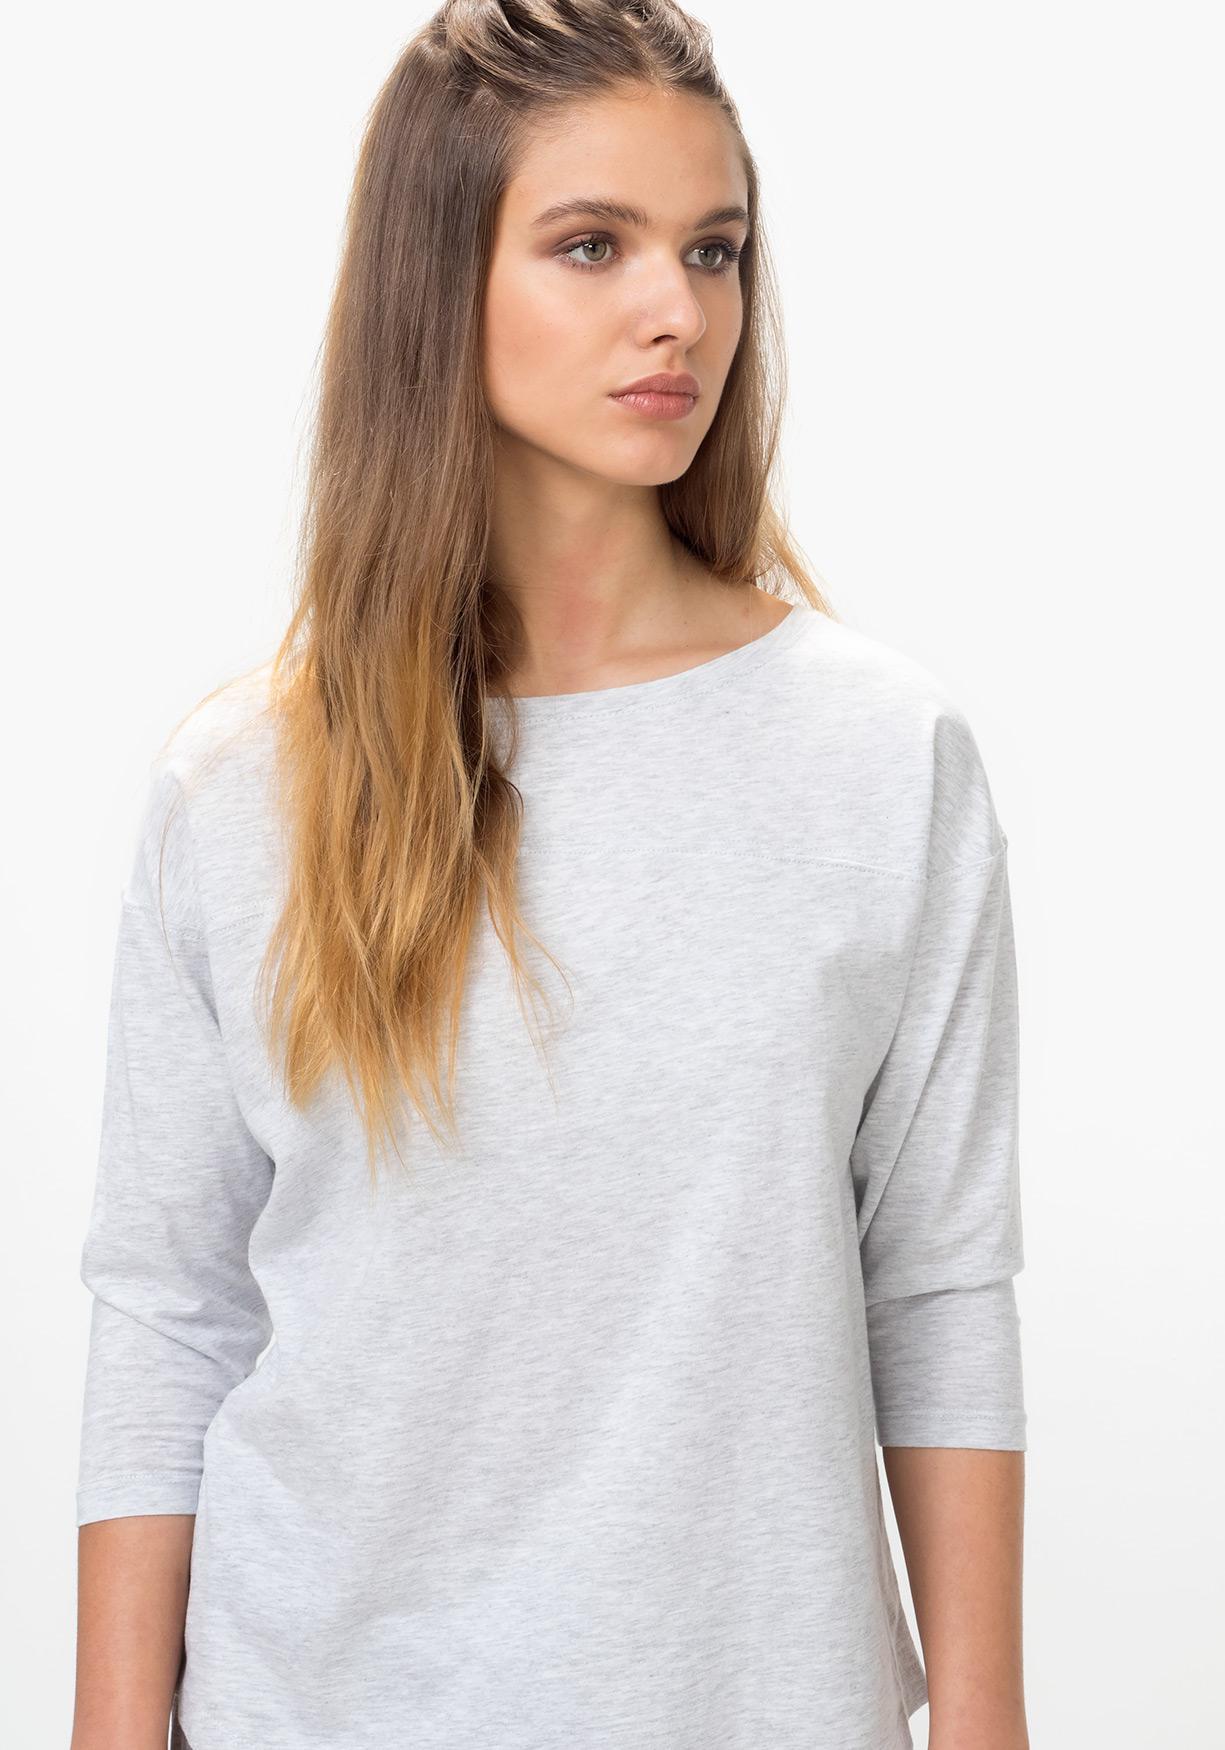 f1886ecf2b Comprar Camiseta lencería de mujer manga 3 4 TEX. ¡Aprovéchate de ...